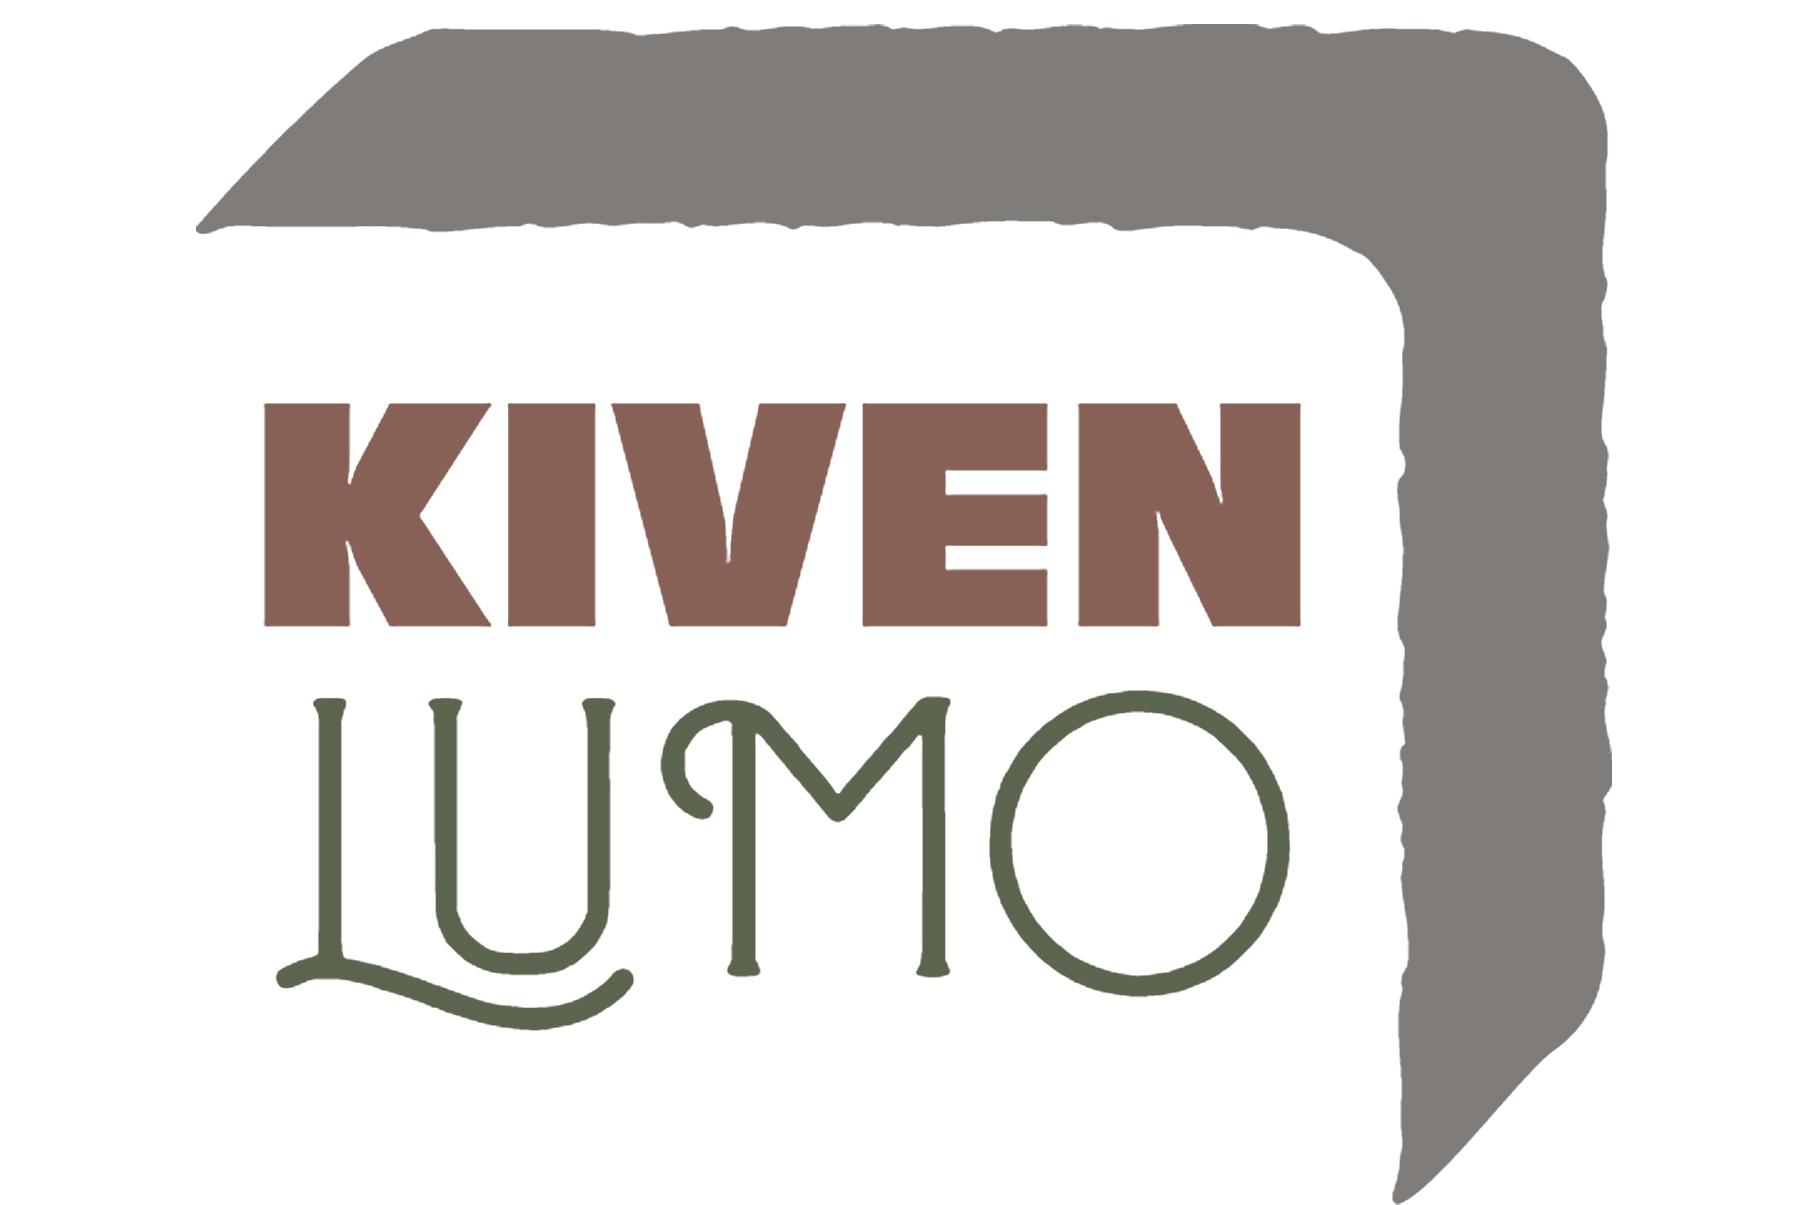 kiven lumo logo